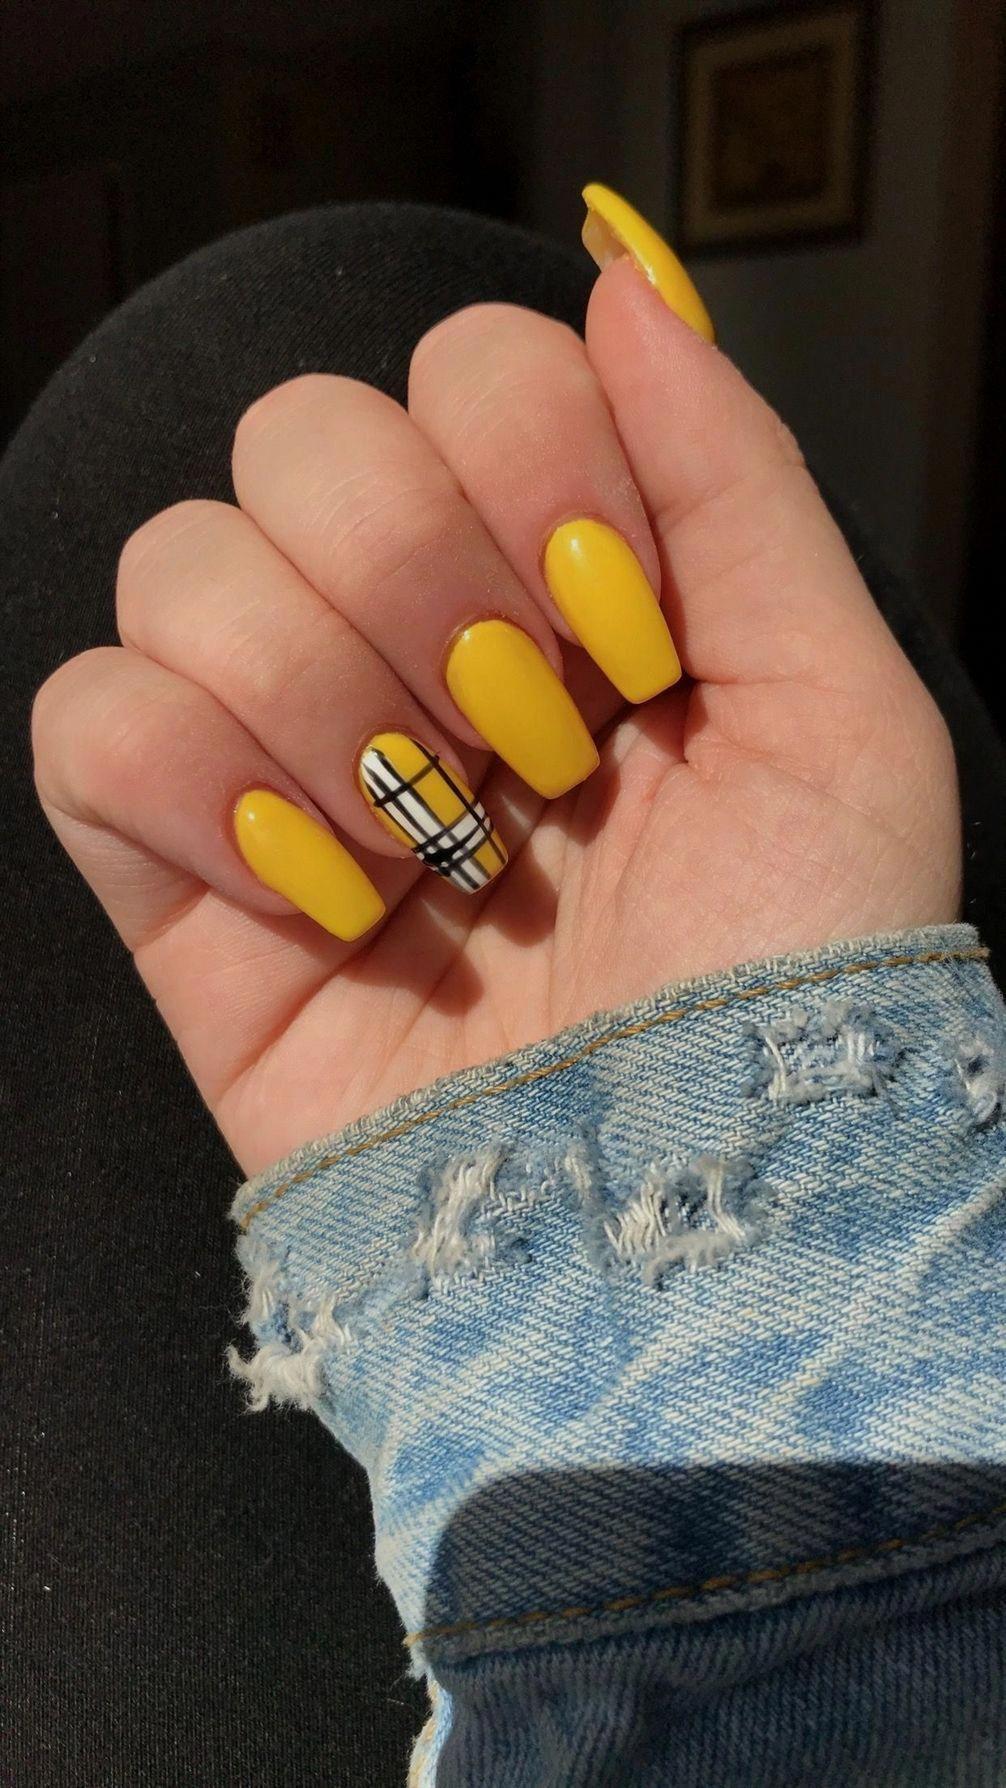 Yellow Plaid Coffin Shaped Acrylic Nails Alreadydesignedunicornideasfornails Gelnails Beautifulacrylicna Yellow Nails Yellow Nails Design Gel Nails French